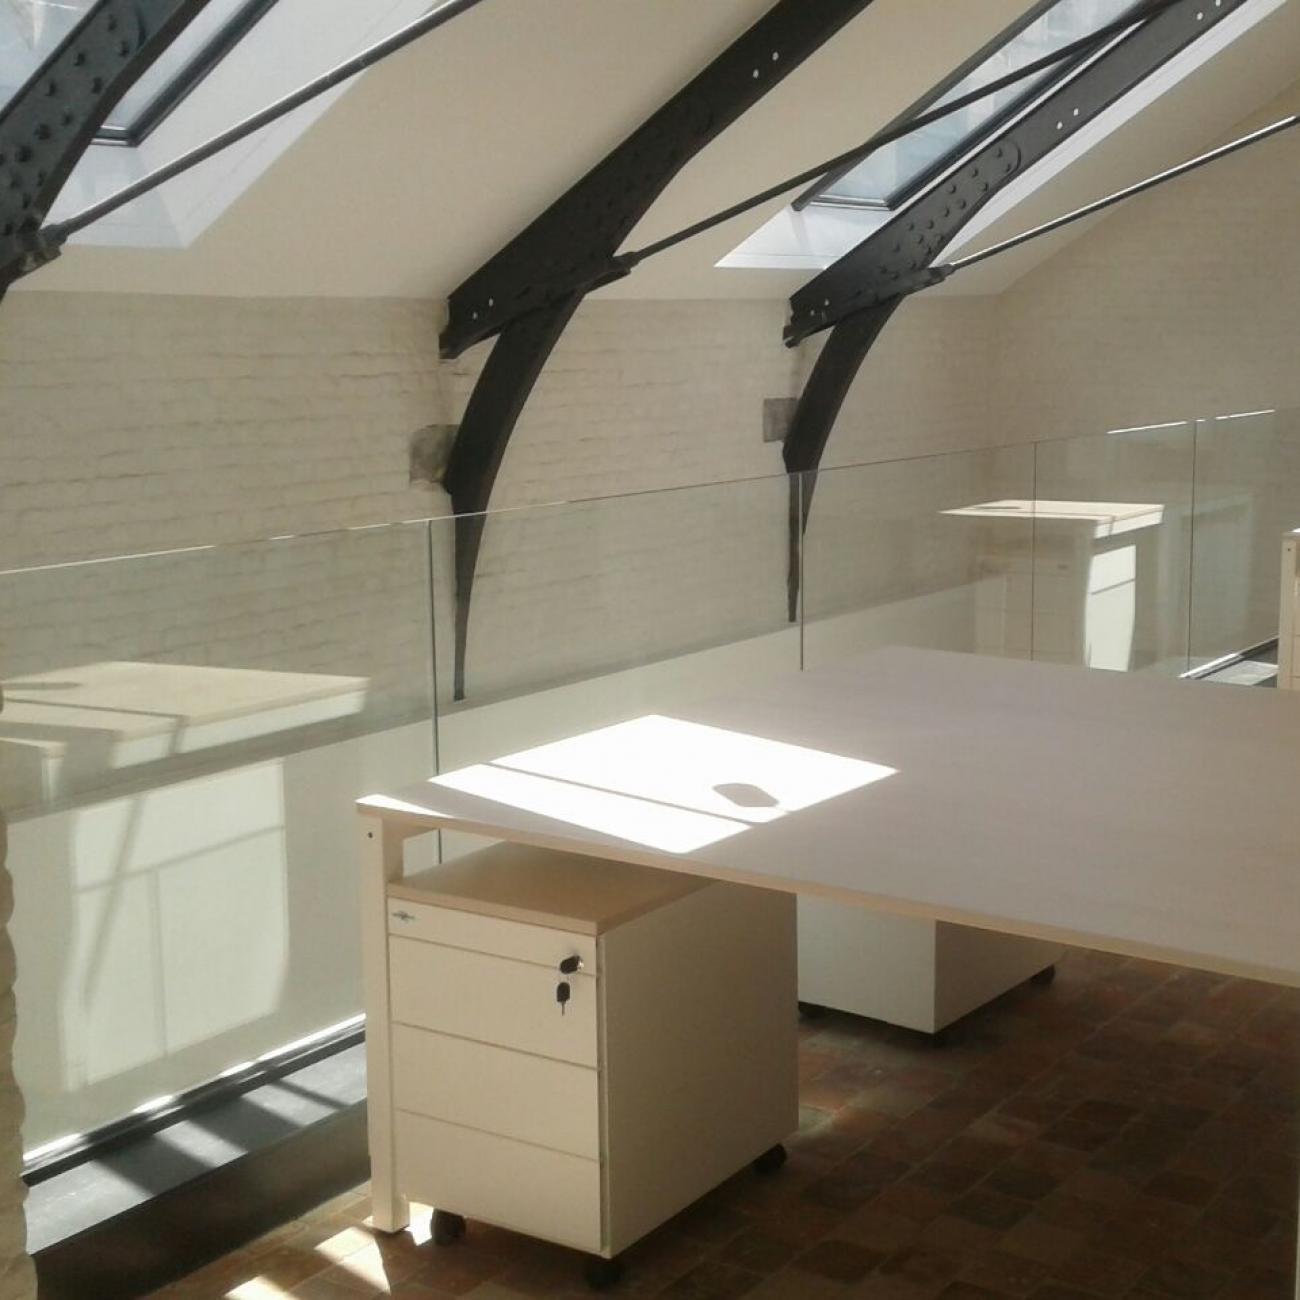 dakspanten + glazen balustrade